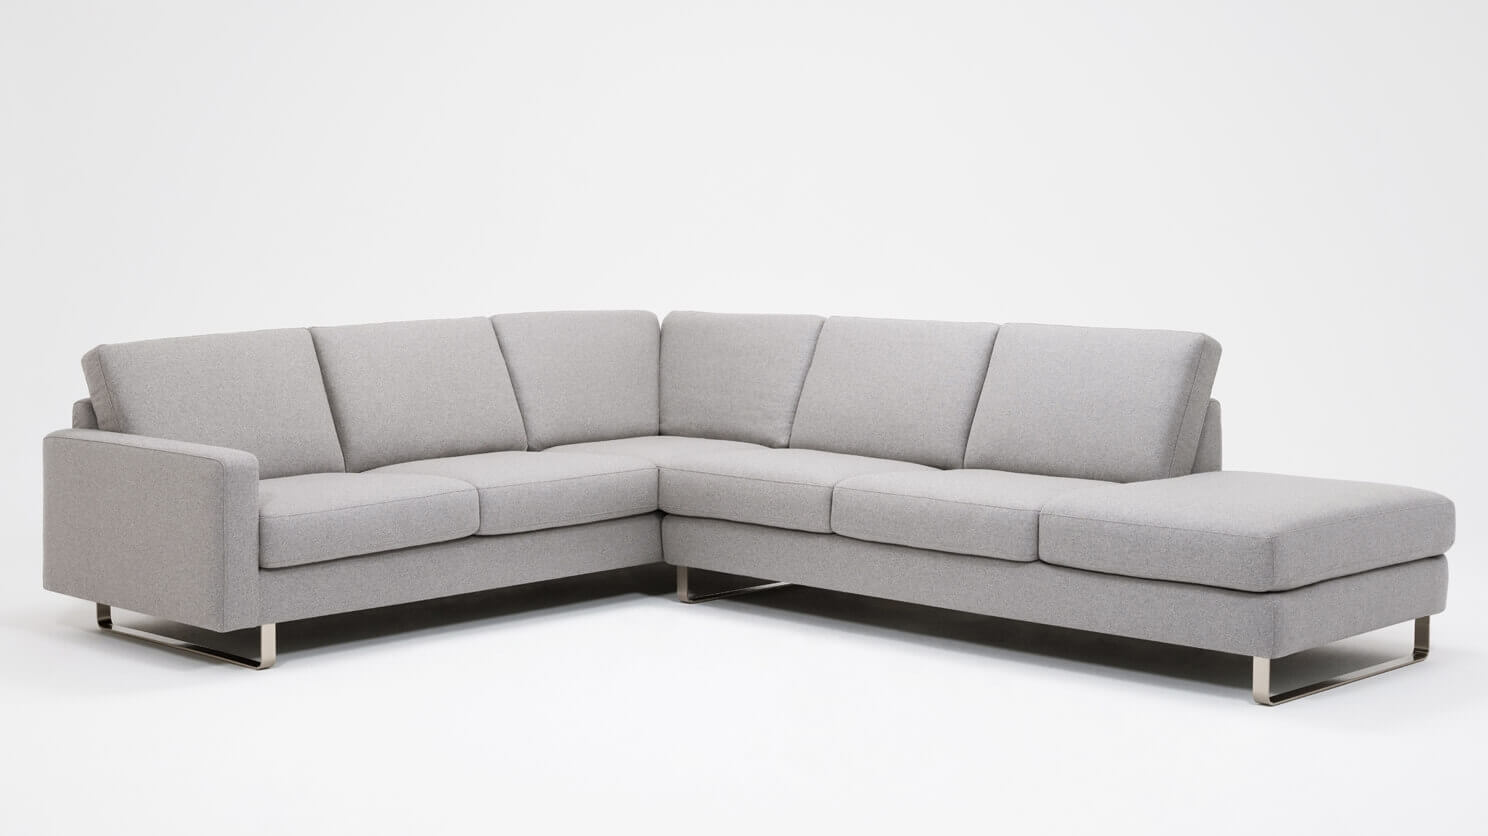 Oskar 2 Piece Sectional Sofa With Headrests Fabric Eq3